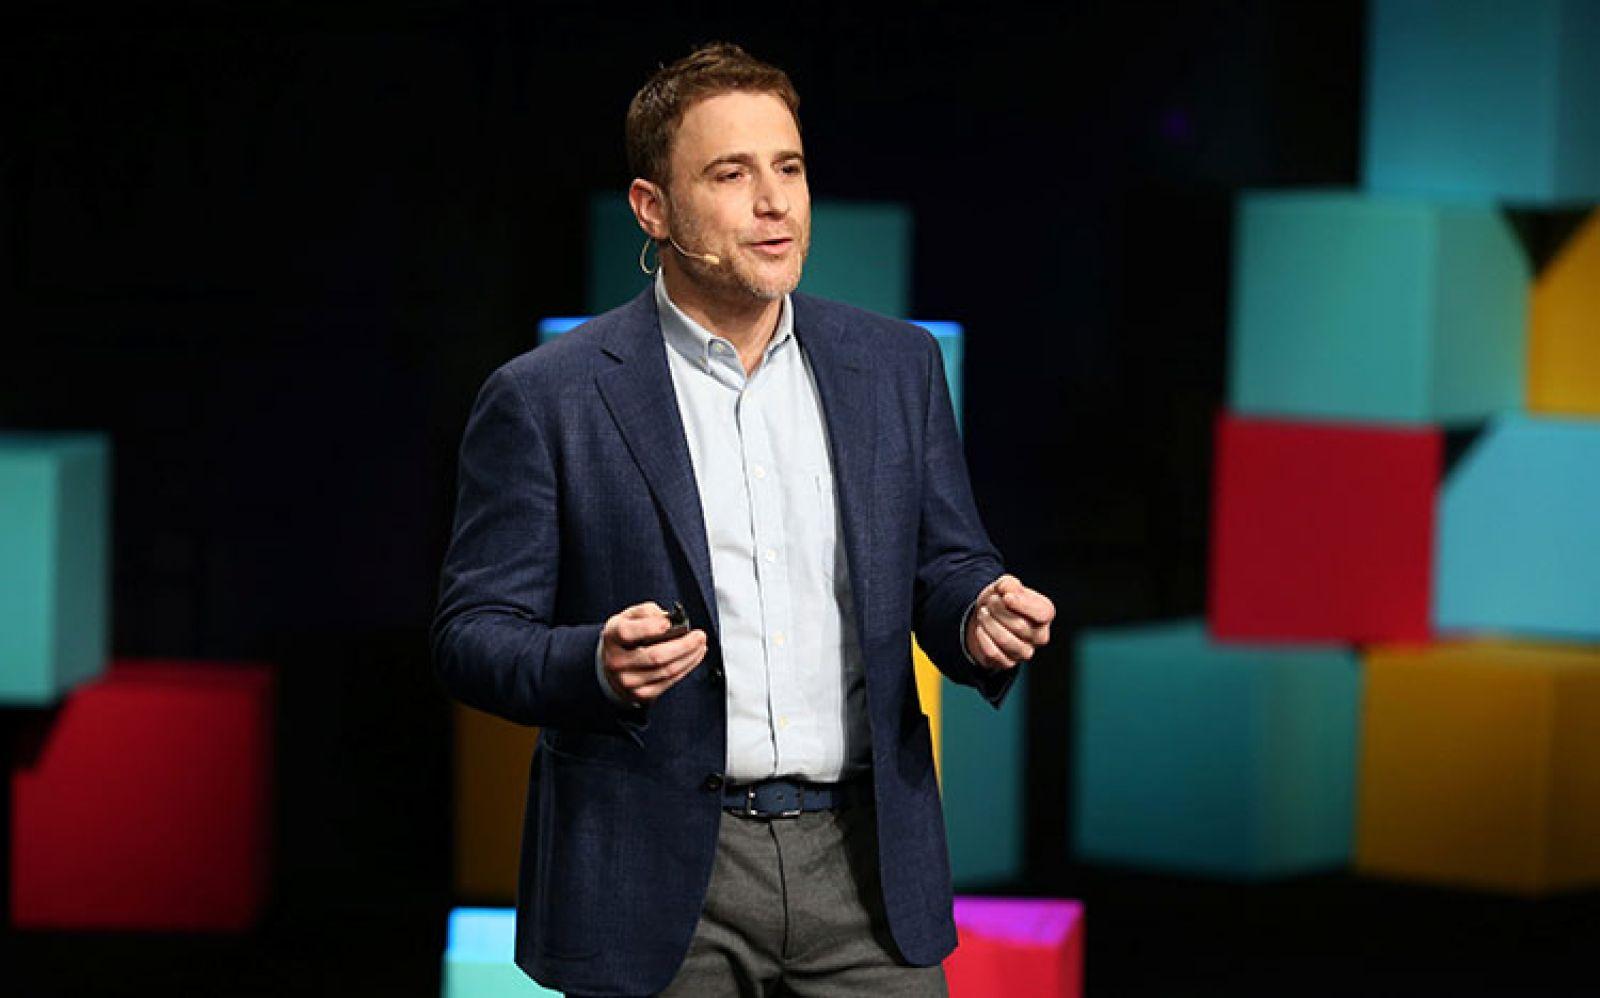 Stewart Butterfield - CEO Hãng cung cấp dịch vụ chat Slack. Nguồn: Reuters